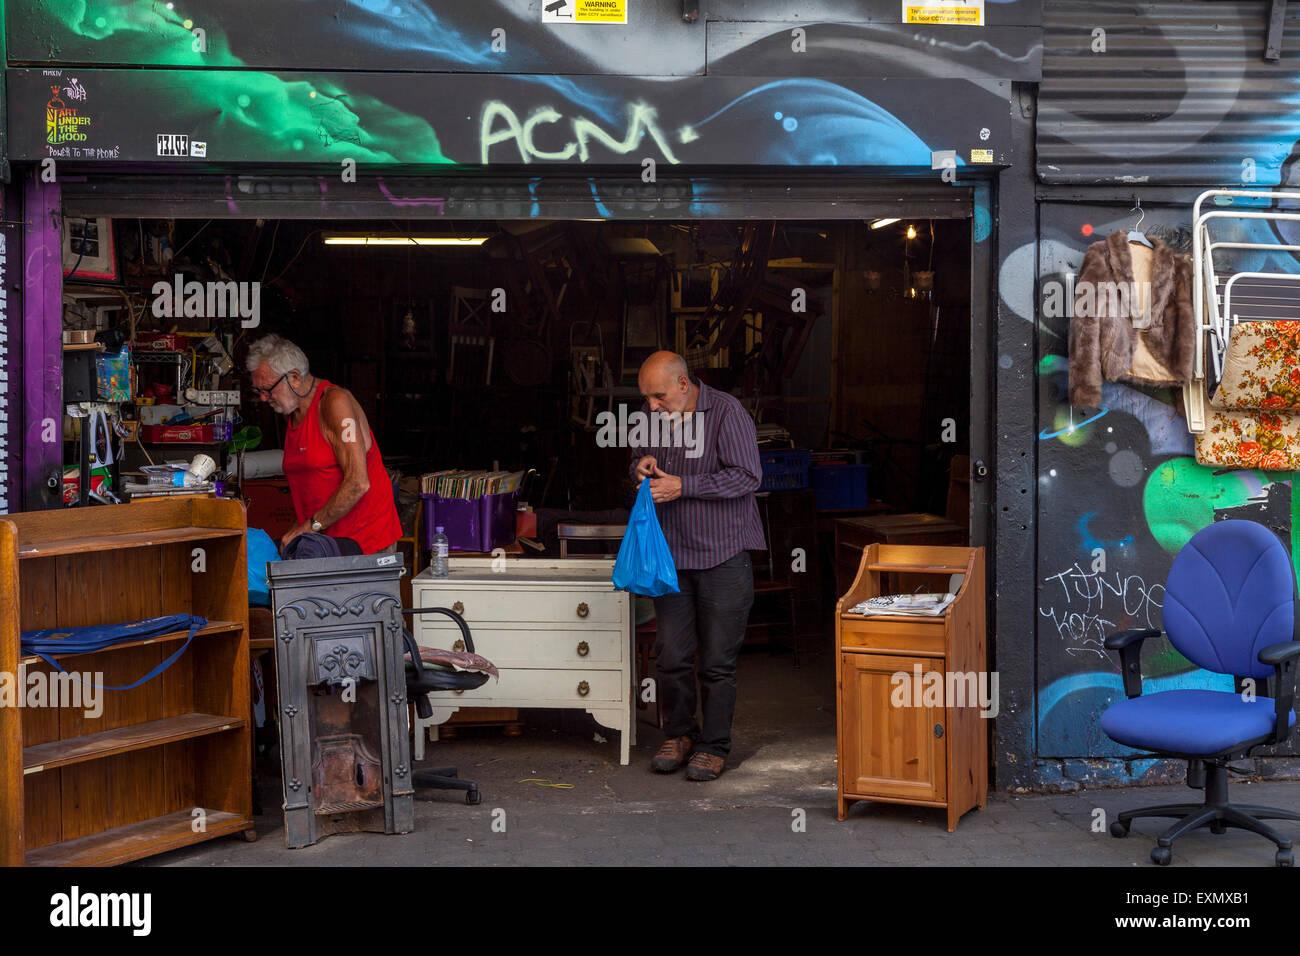 Second Hand Shop, Brick Lane, London, Engalnd - Stock Image